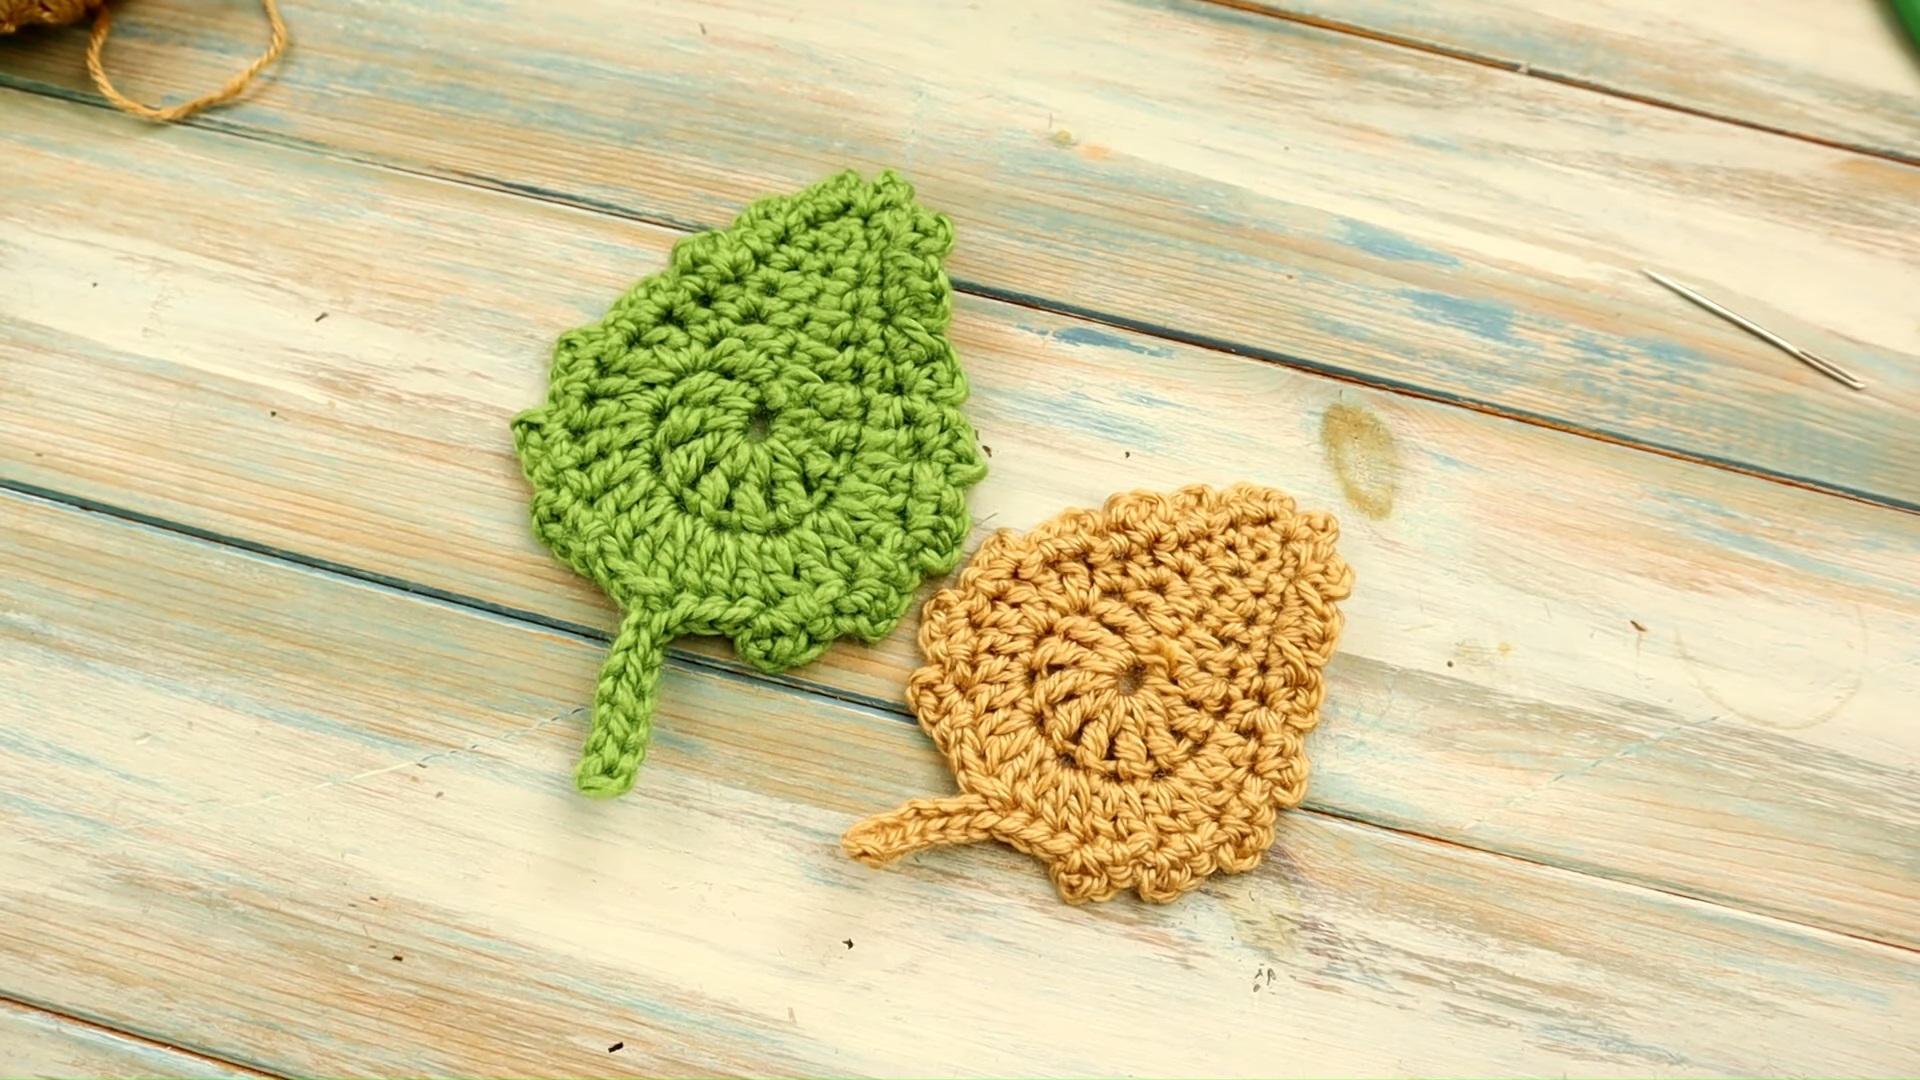 5 Minute Crochet Leaf